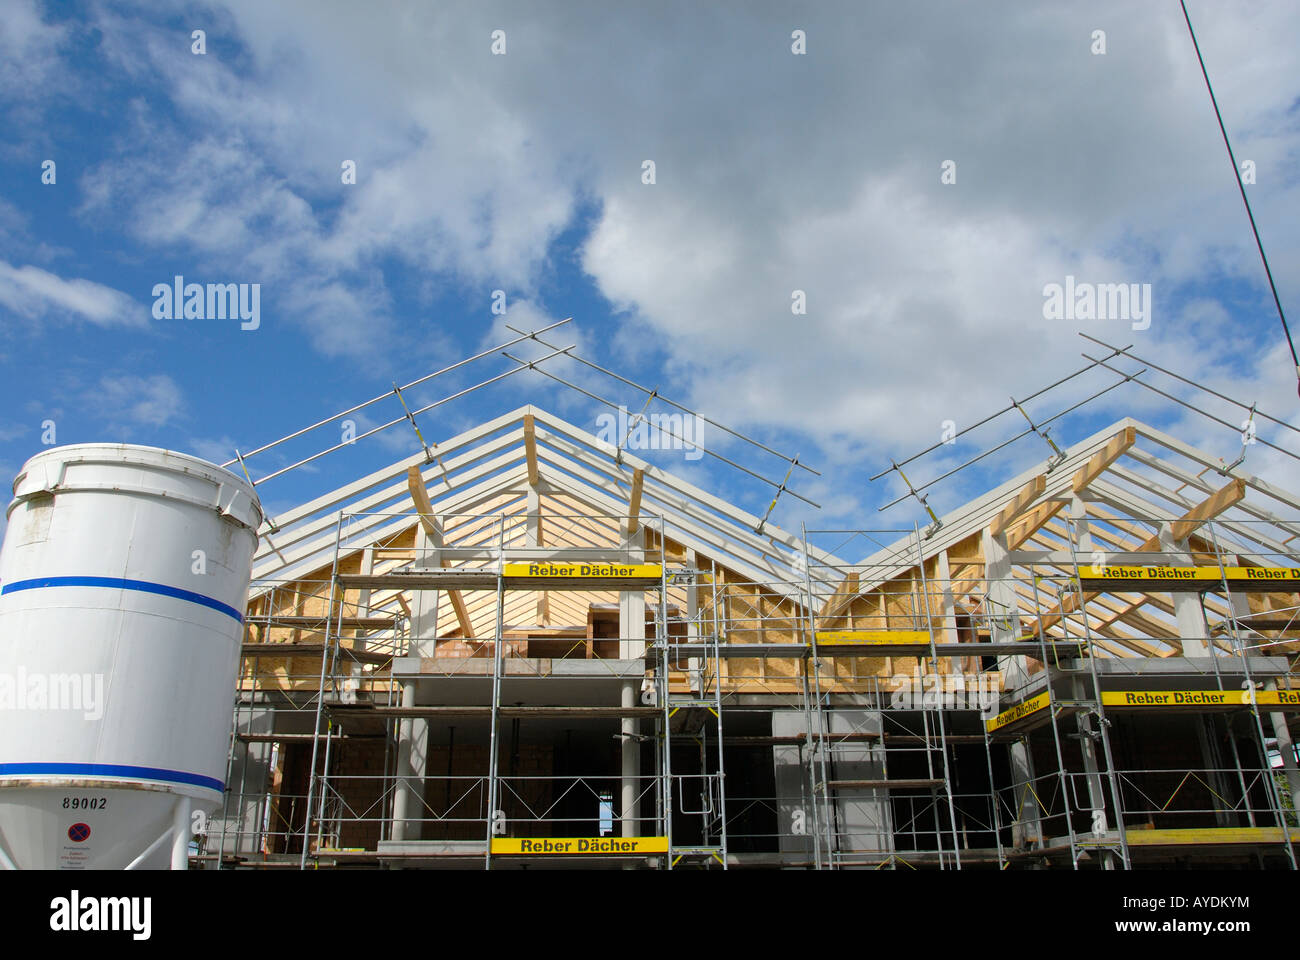 Baustelle auf der Coutryside Stockbild